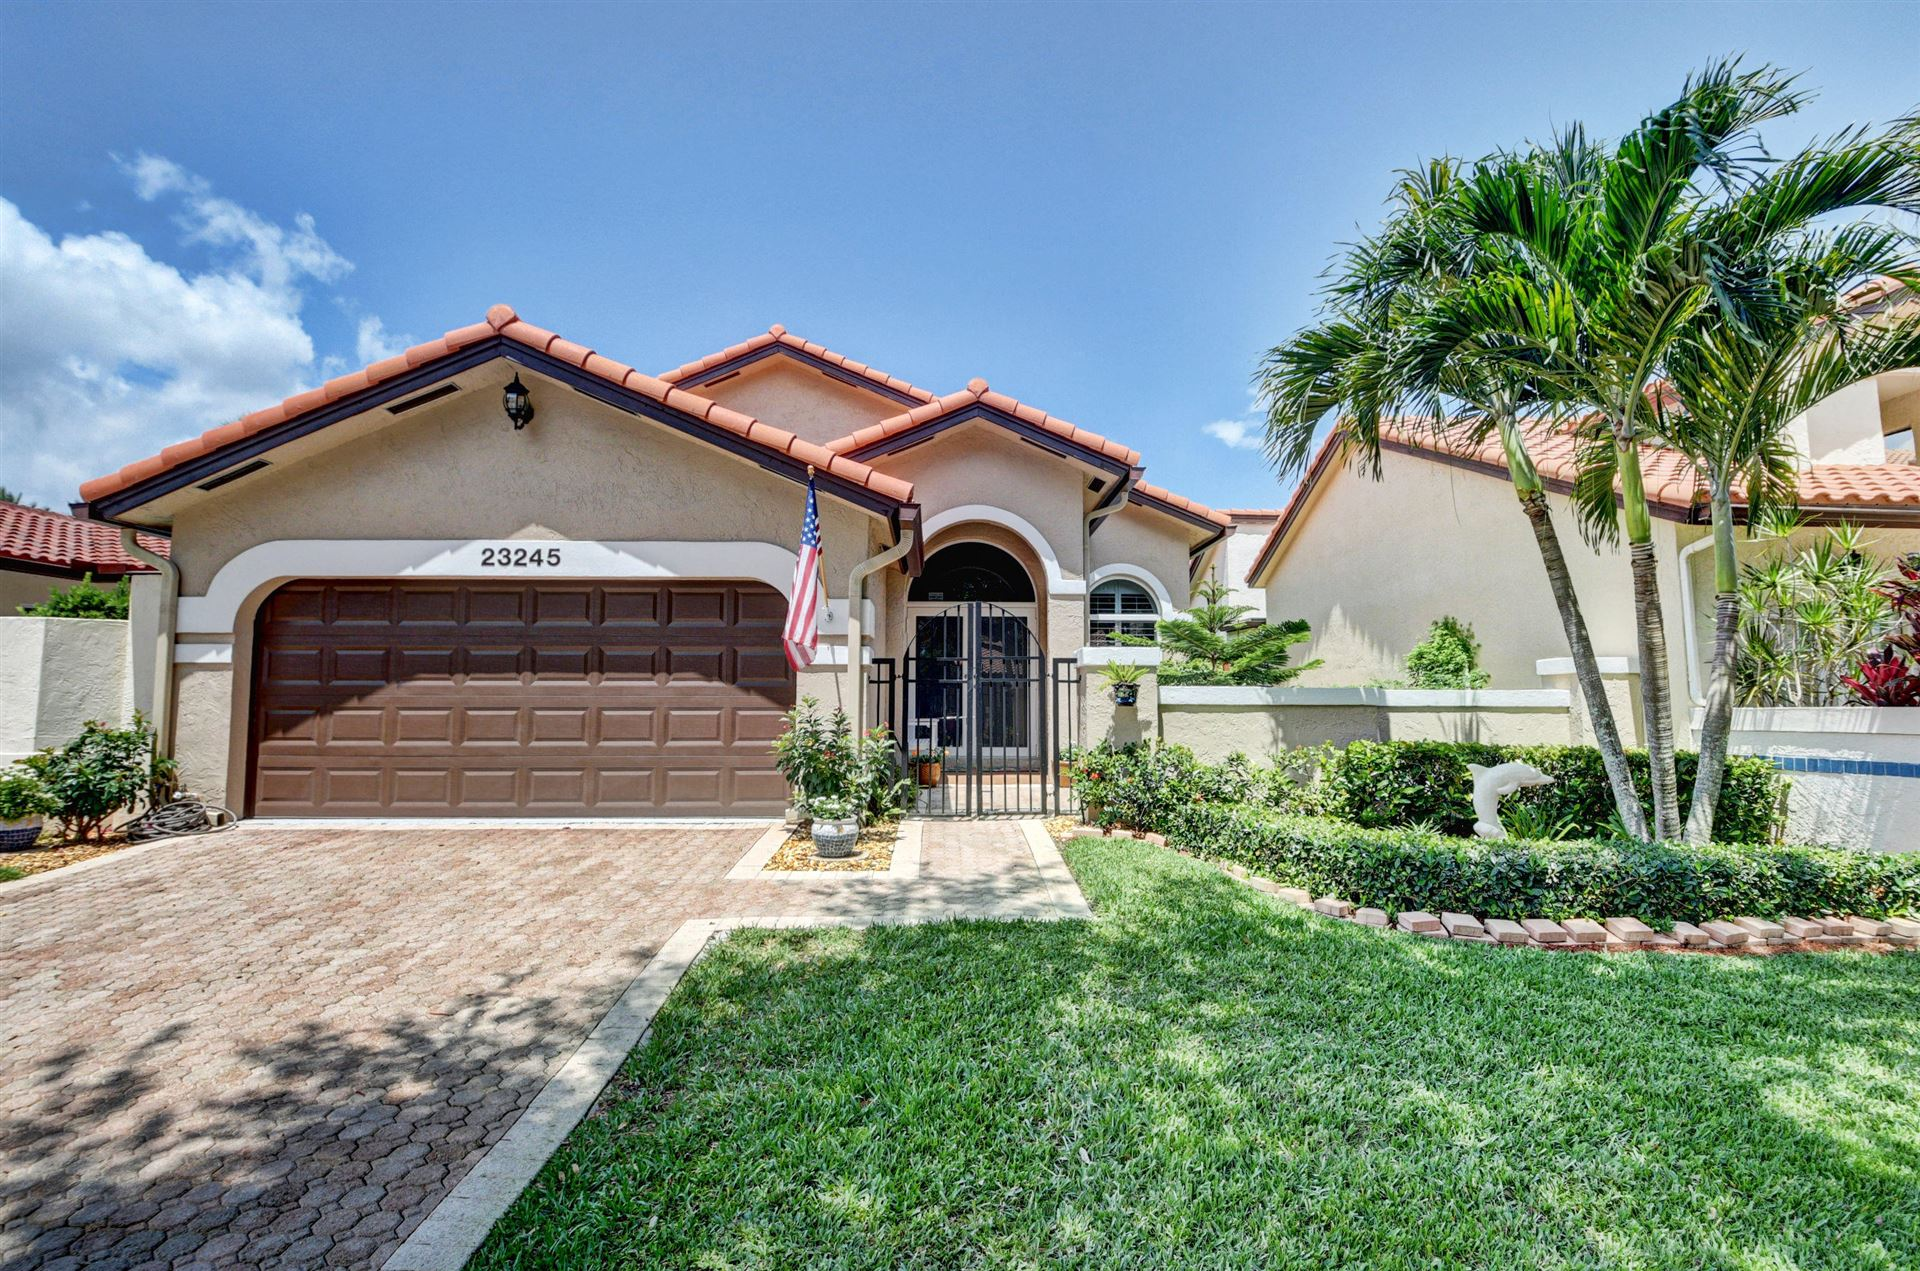 23245 Via Stel, Boca Raton, FL 33433 - #: RX-10624625